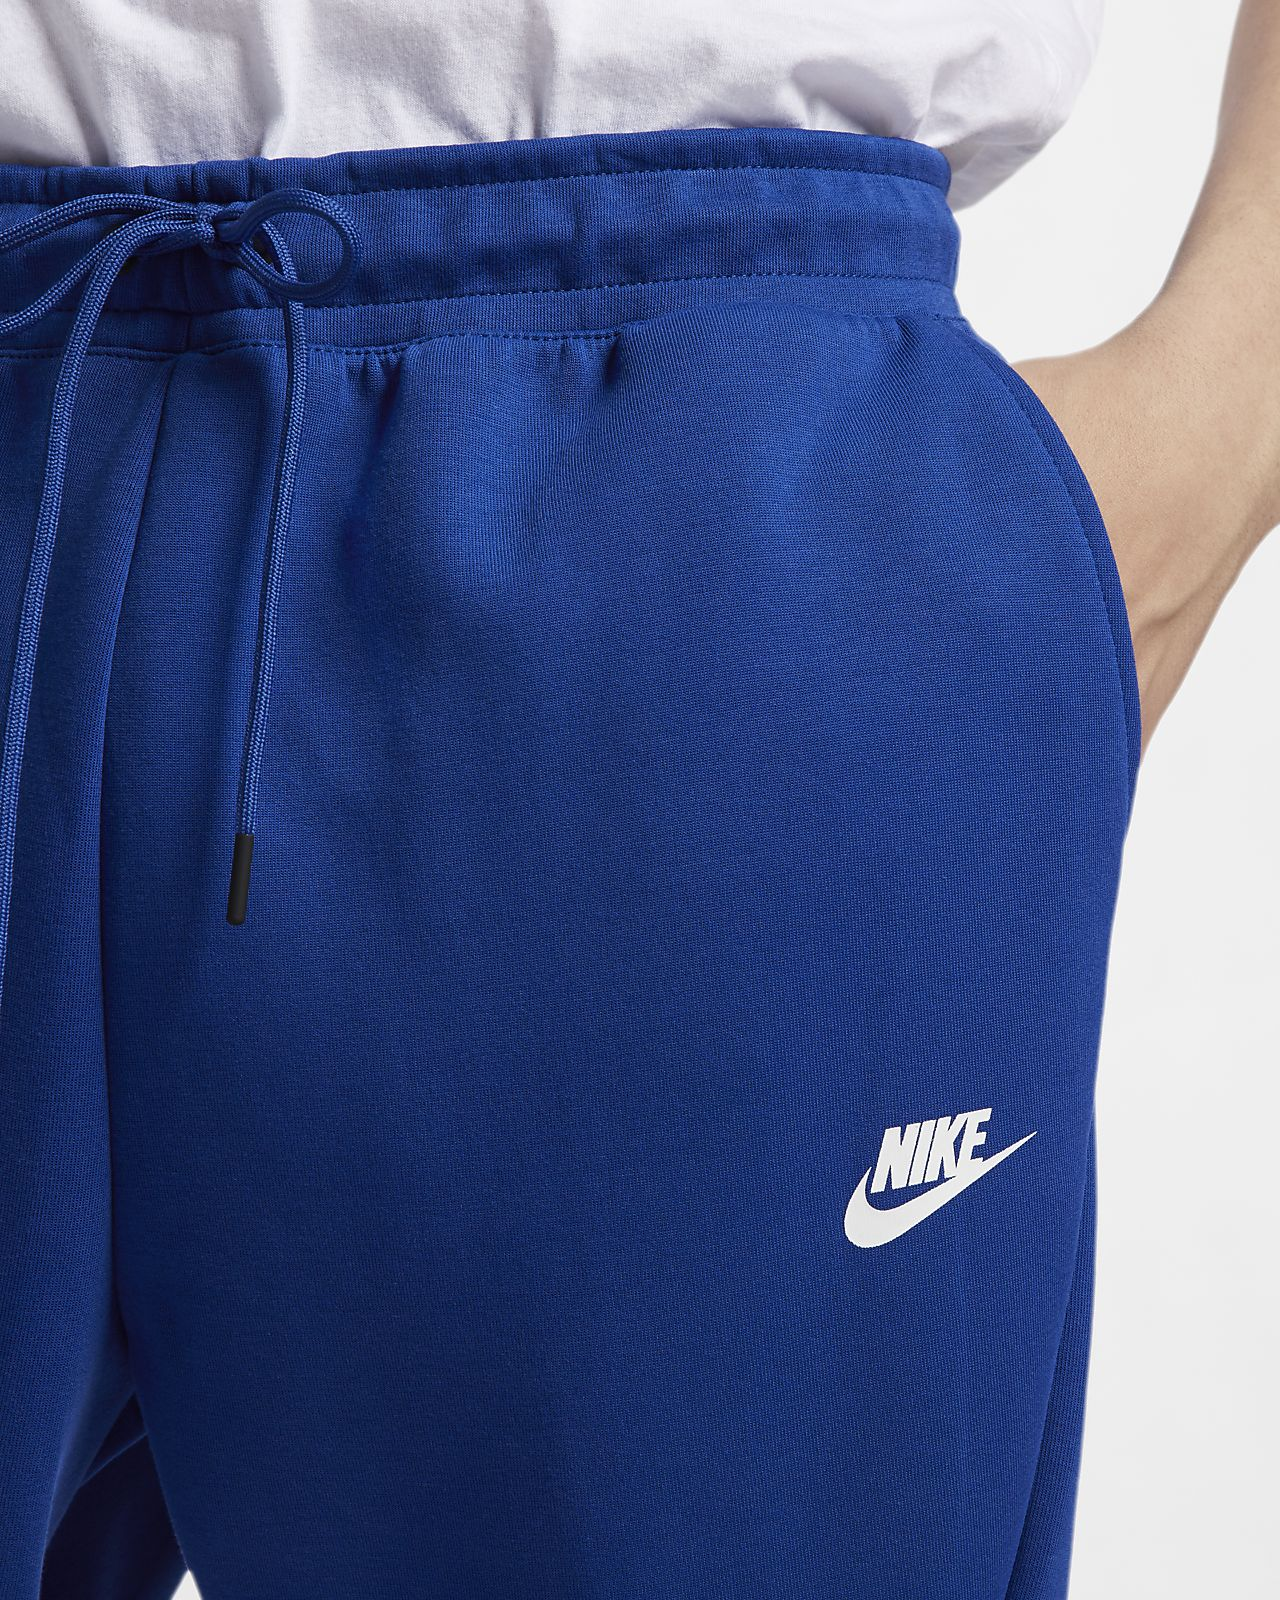 b05f6dbf826b Nike Sportswear Tech Fleece Men s Joggers. Nike.com GB